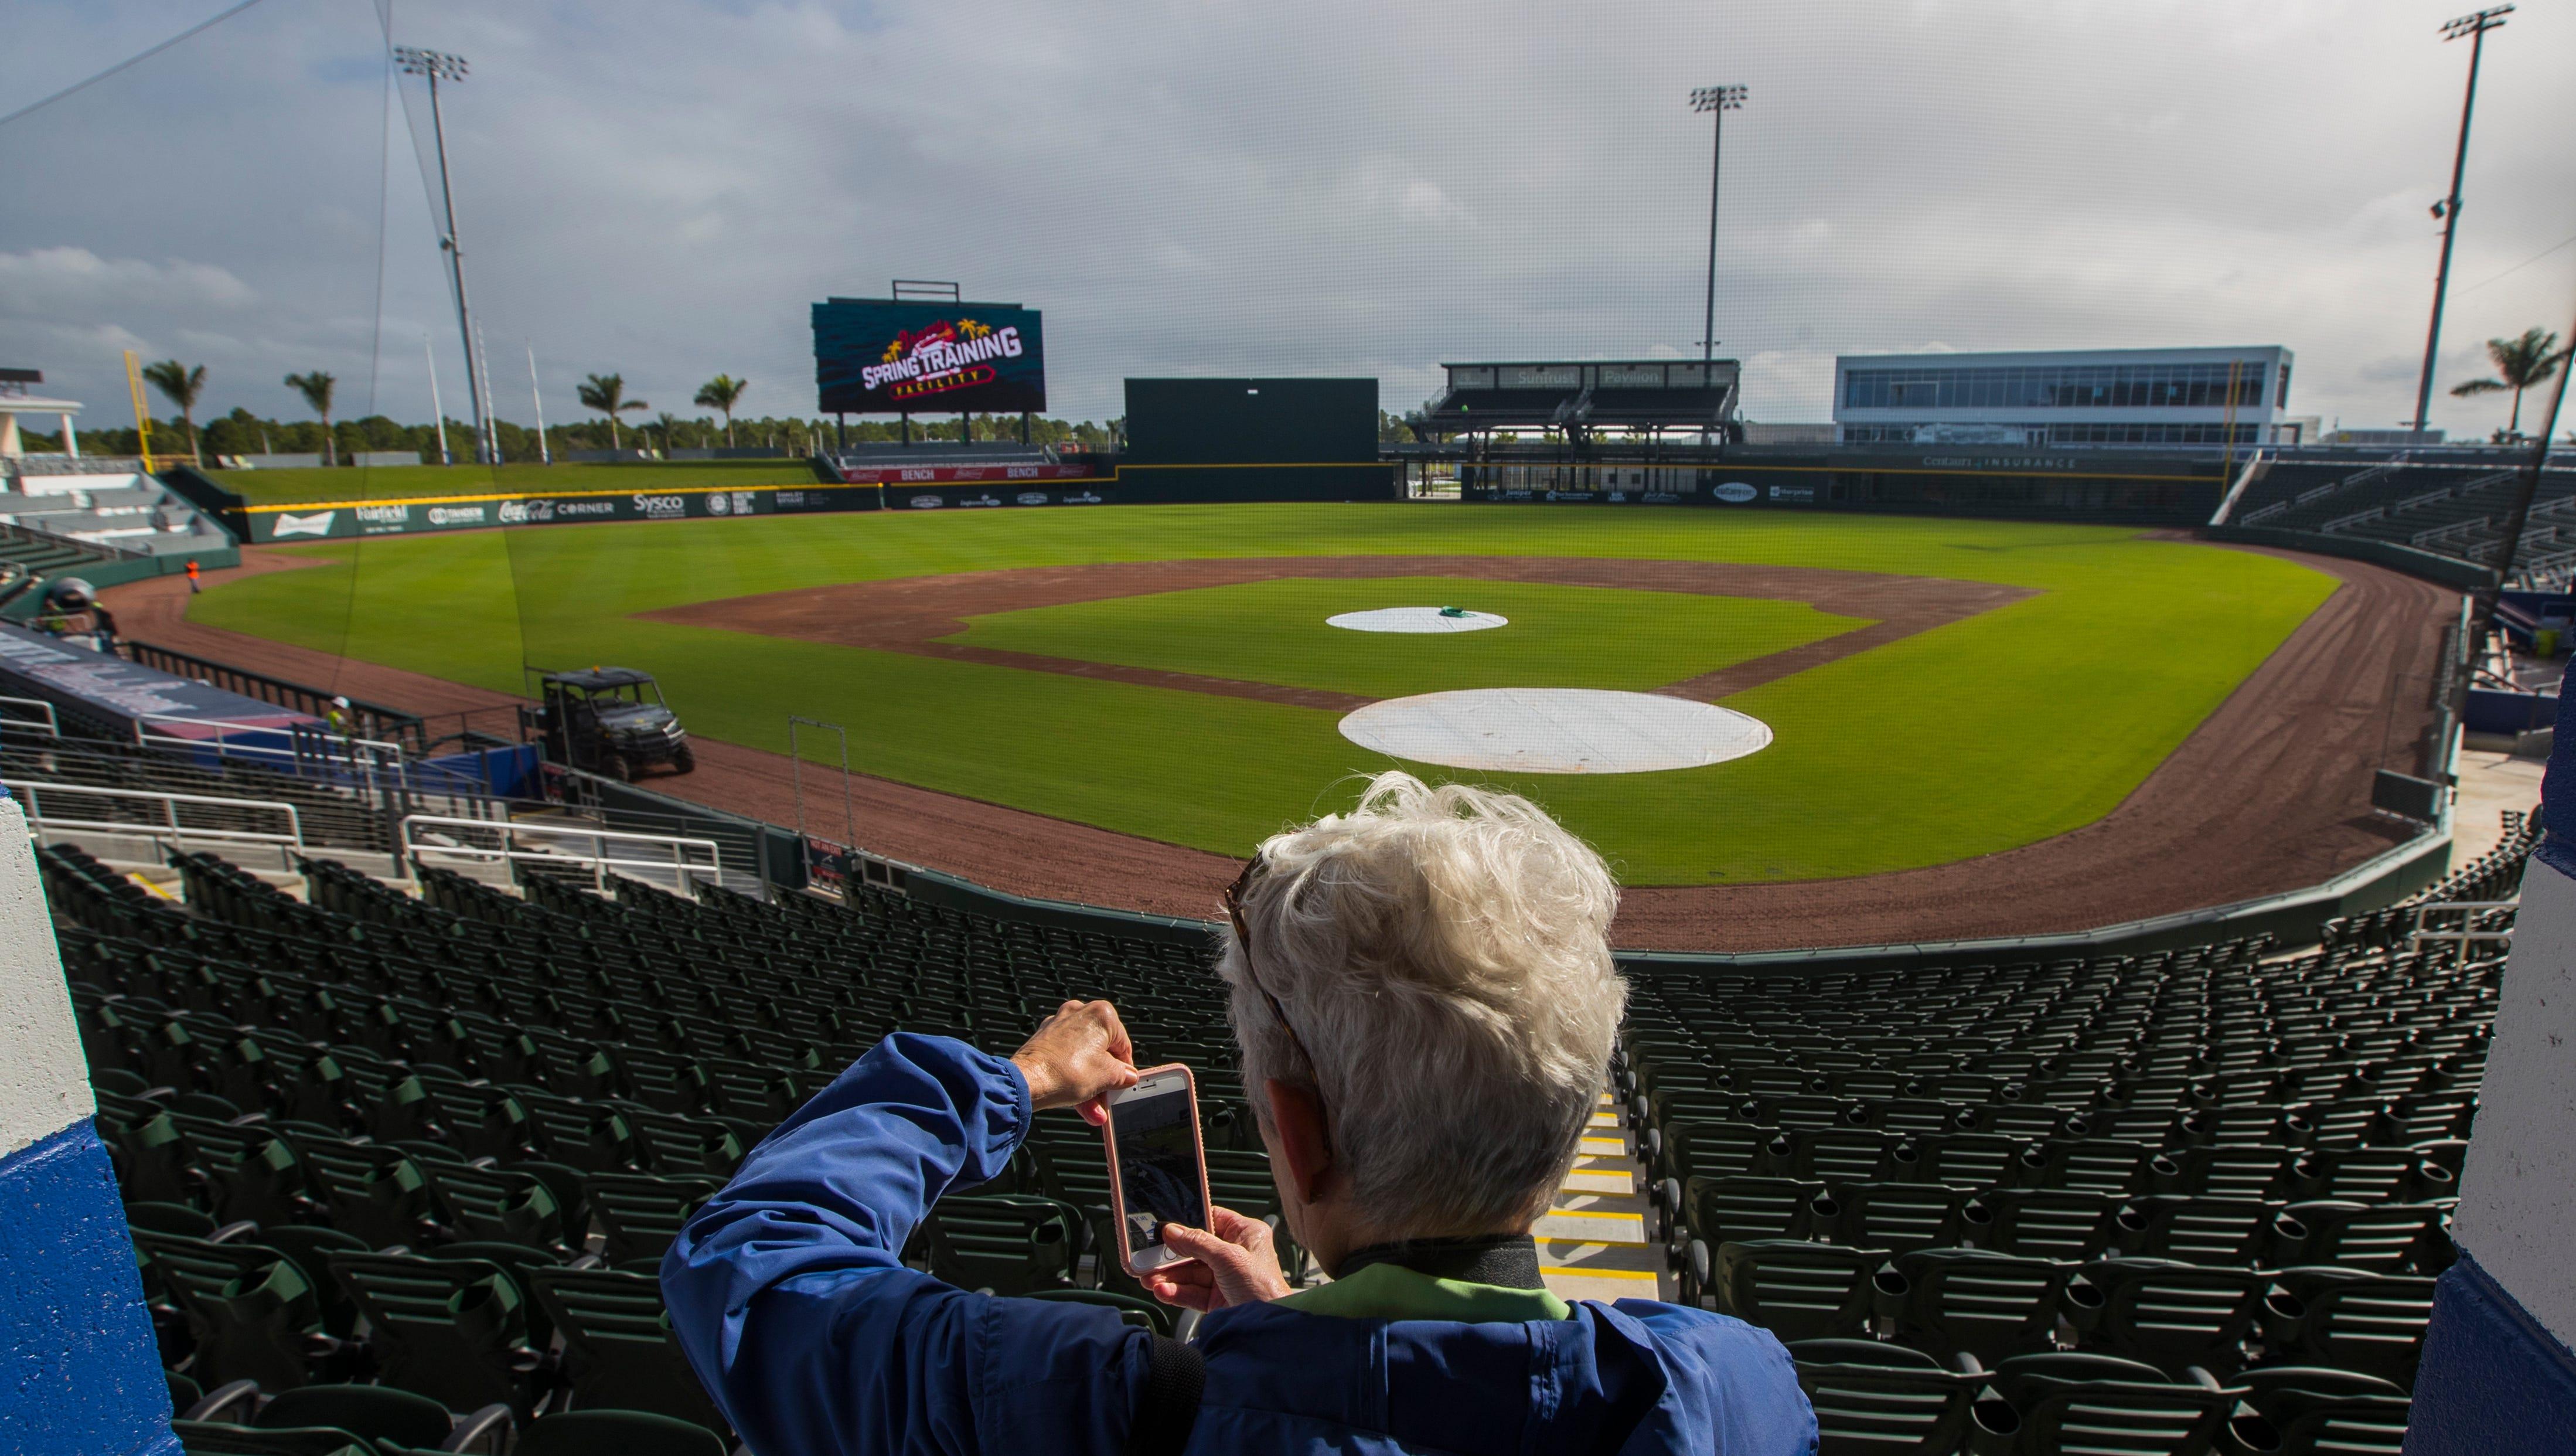 New Atlanta Braves Spring Training Stadium Opens In North Port